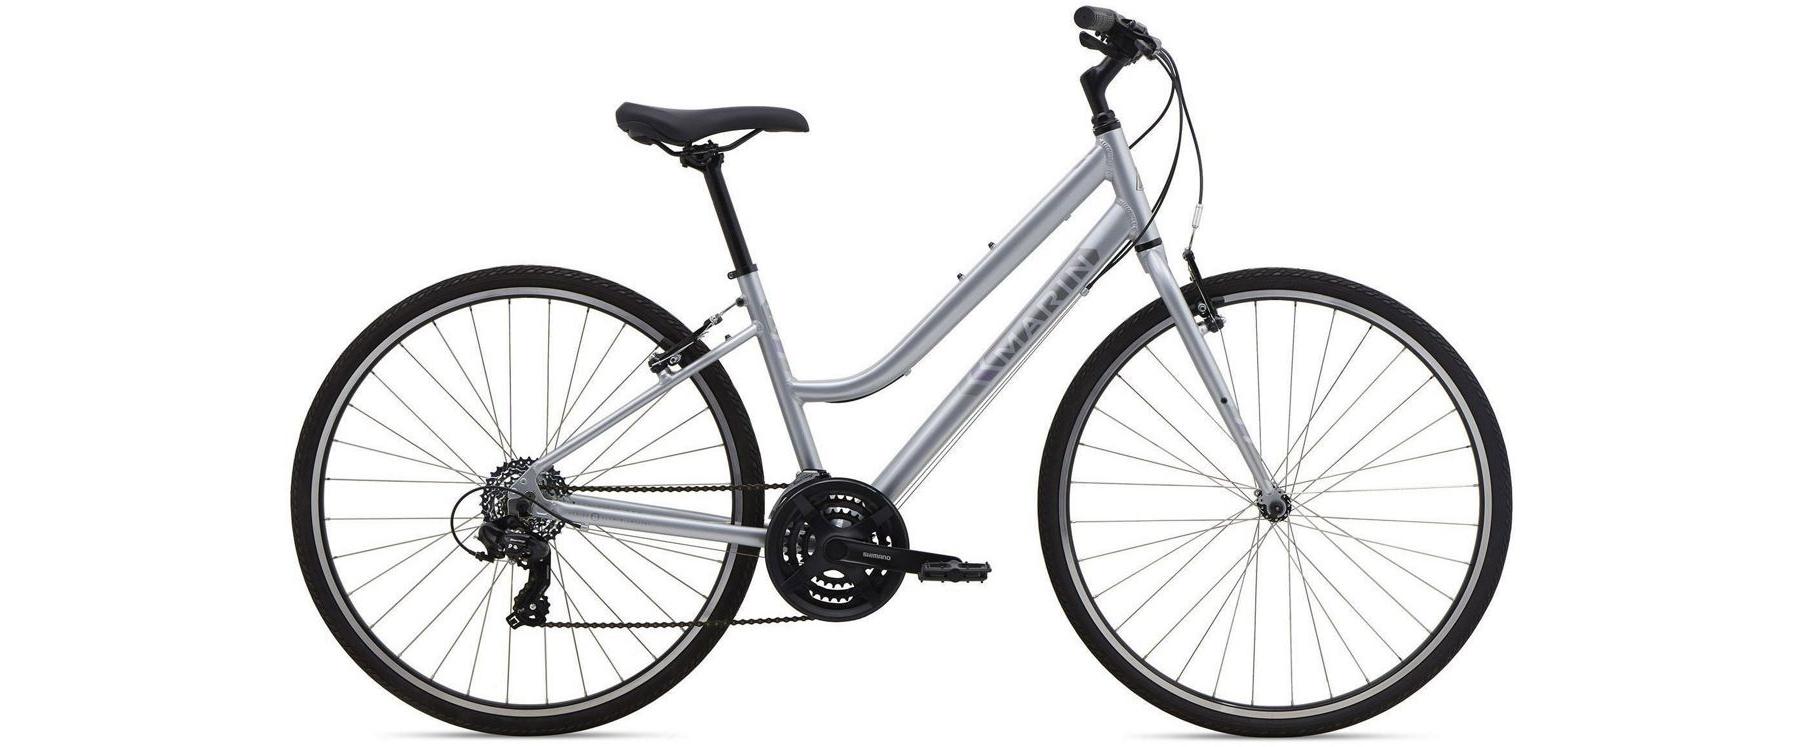 2019 Marin Kentfield CS1 City Bike 2019 £199 @ Chain Reaction Cycles